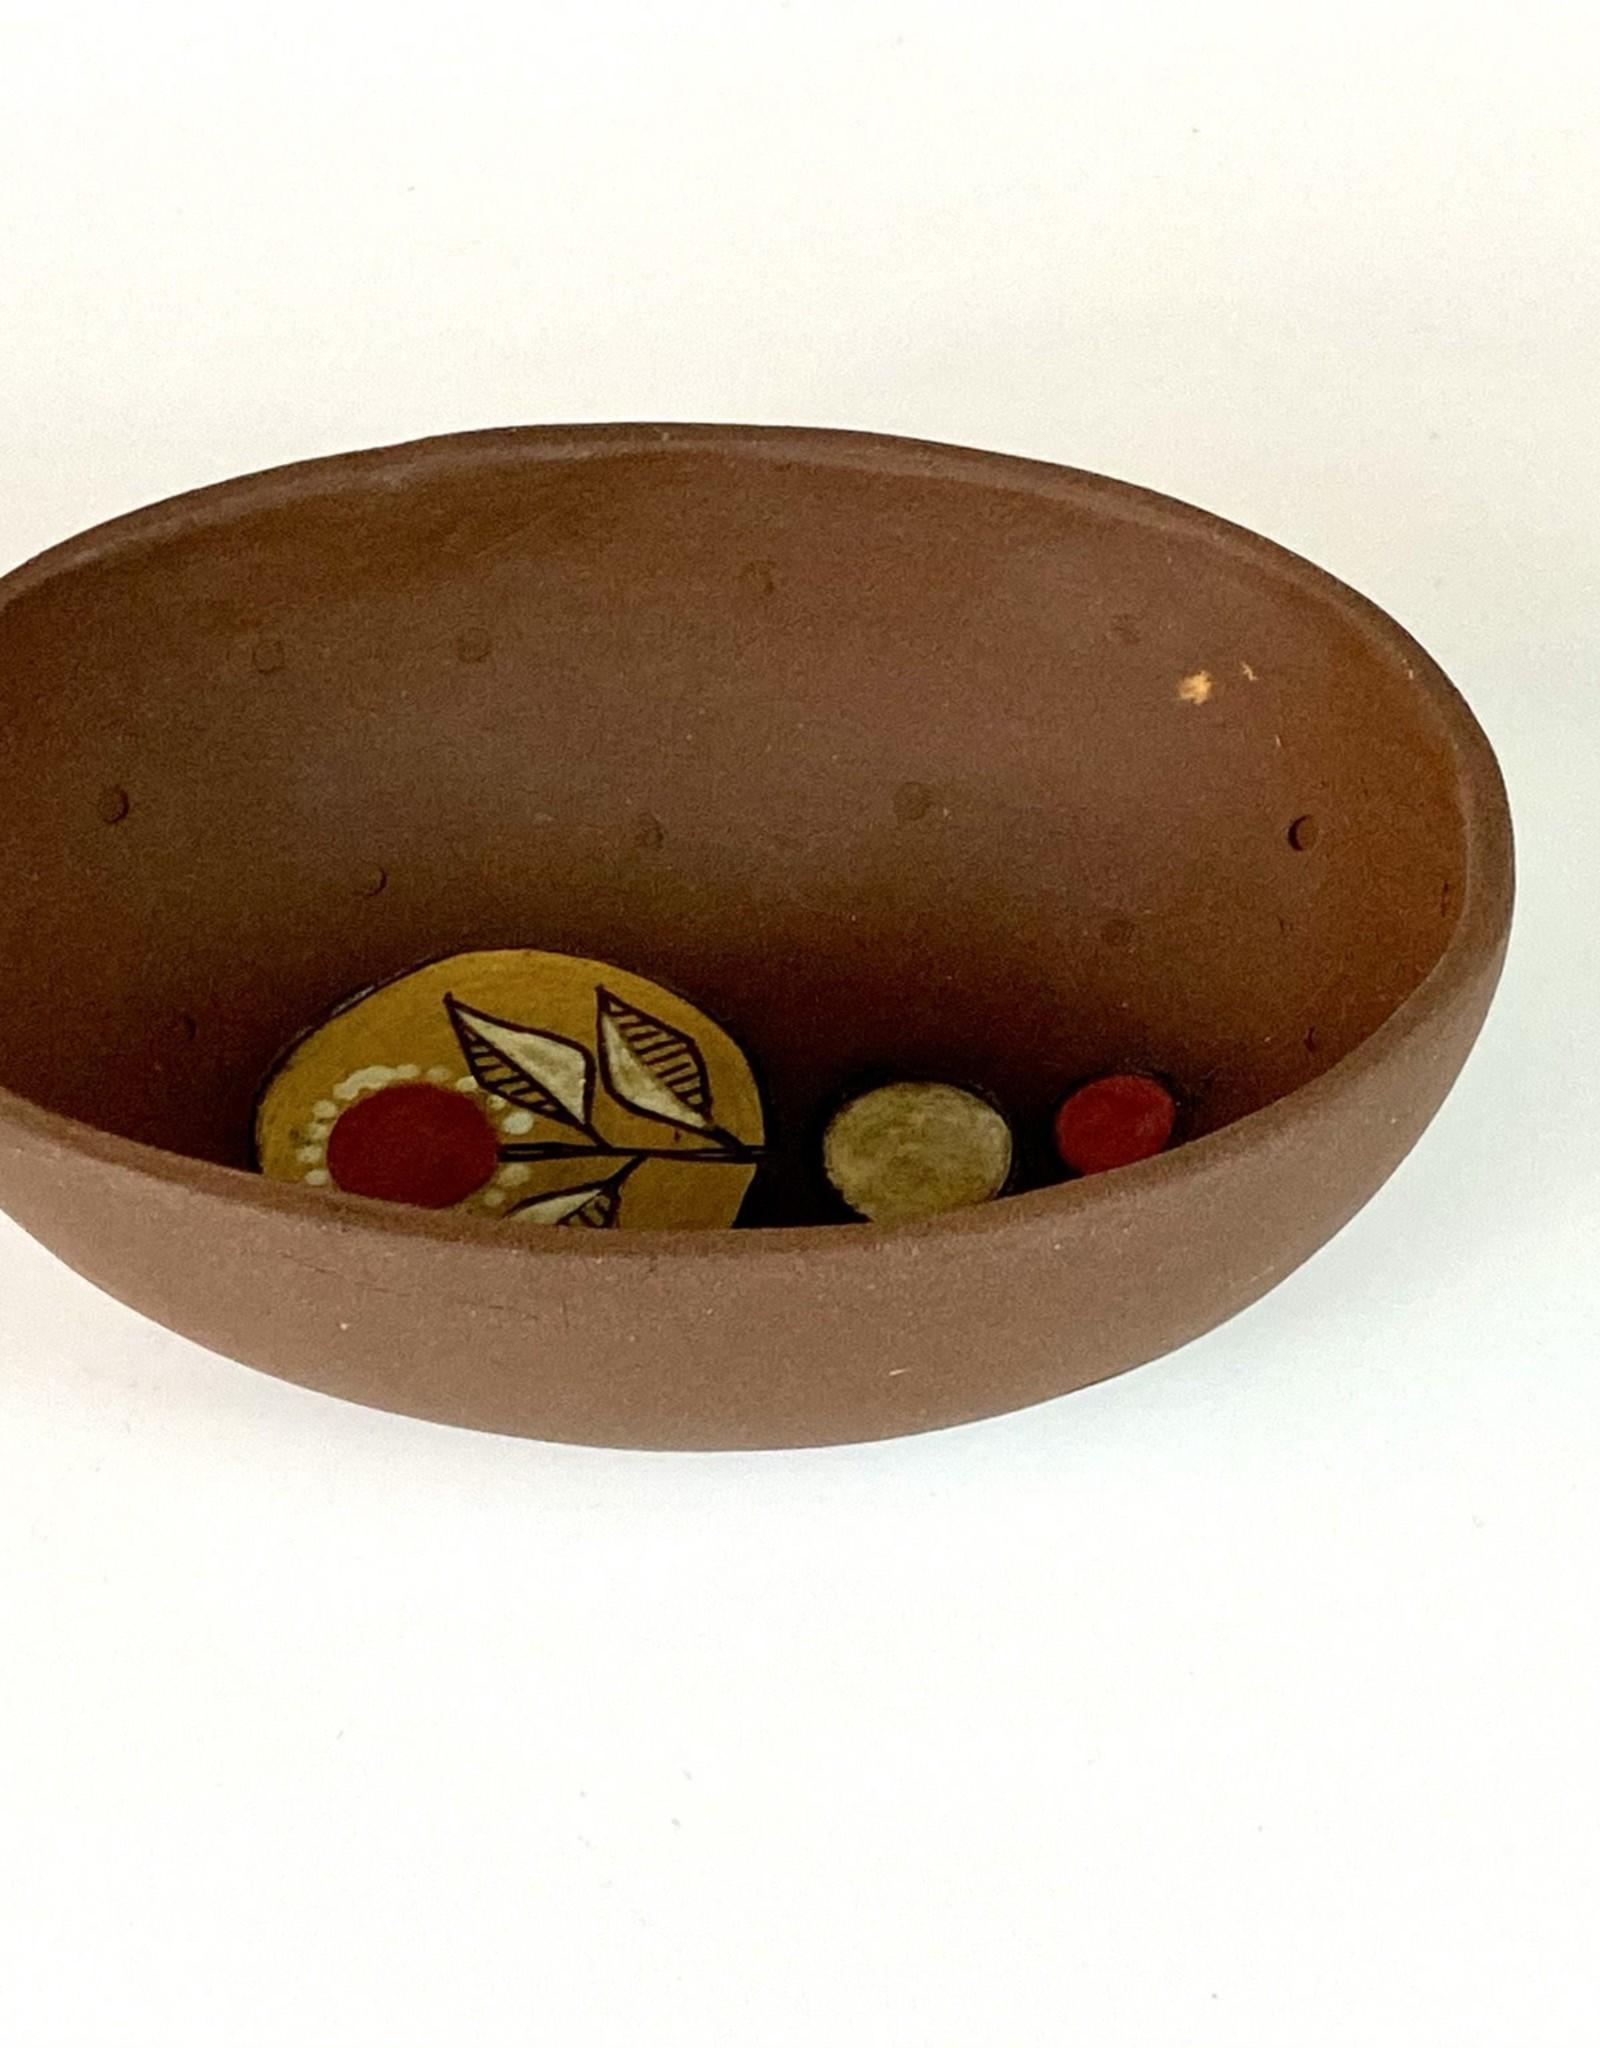 Anshula Tayal Amaati small oval bowl (red dot design)